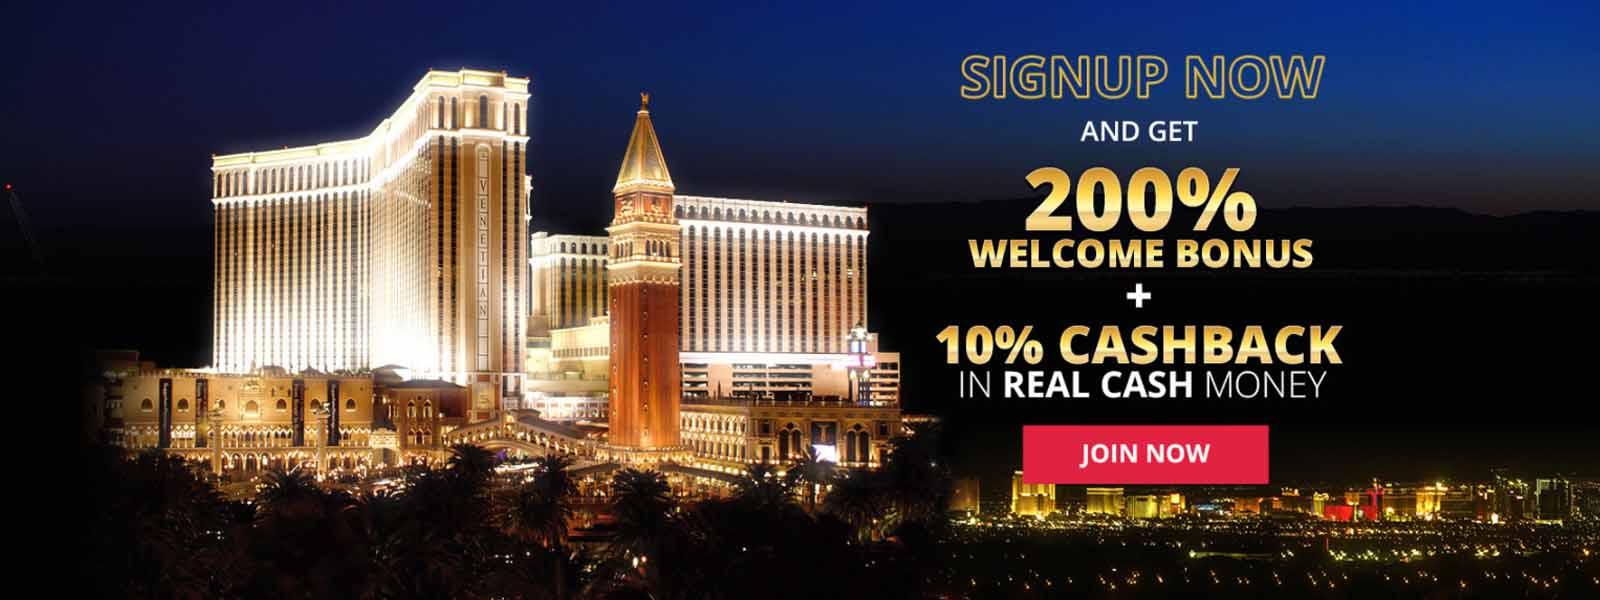 https://www.gamblingherald.com/visit/casino-venetian/